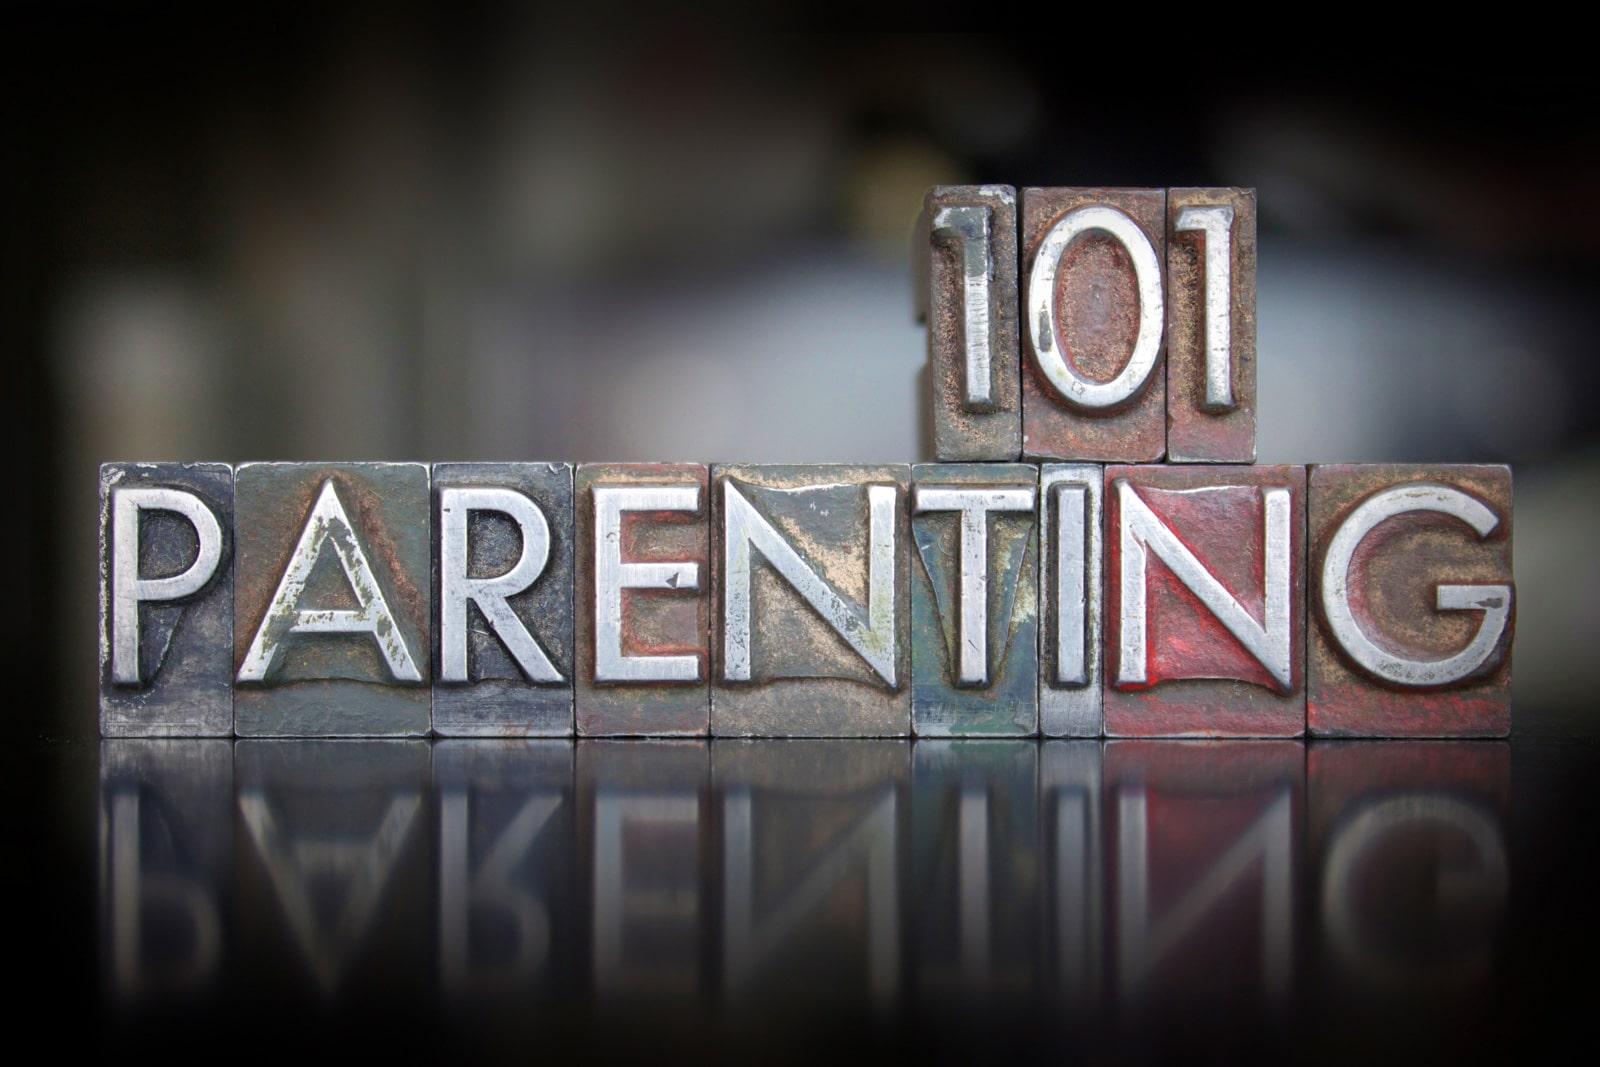 parenting 101 sign